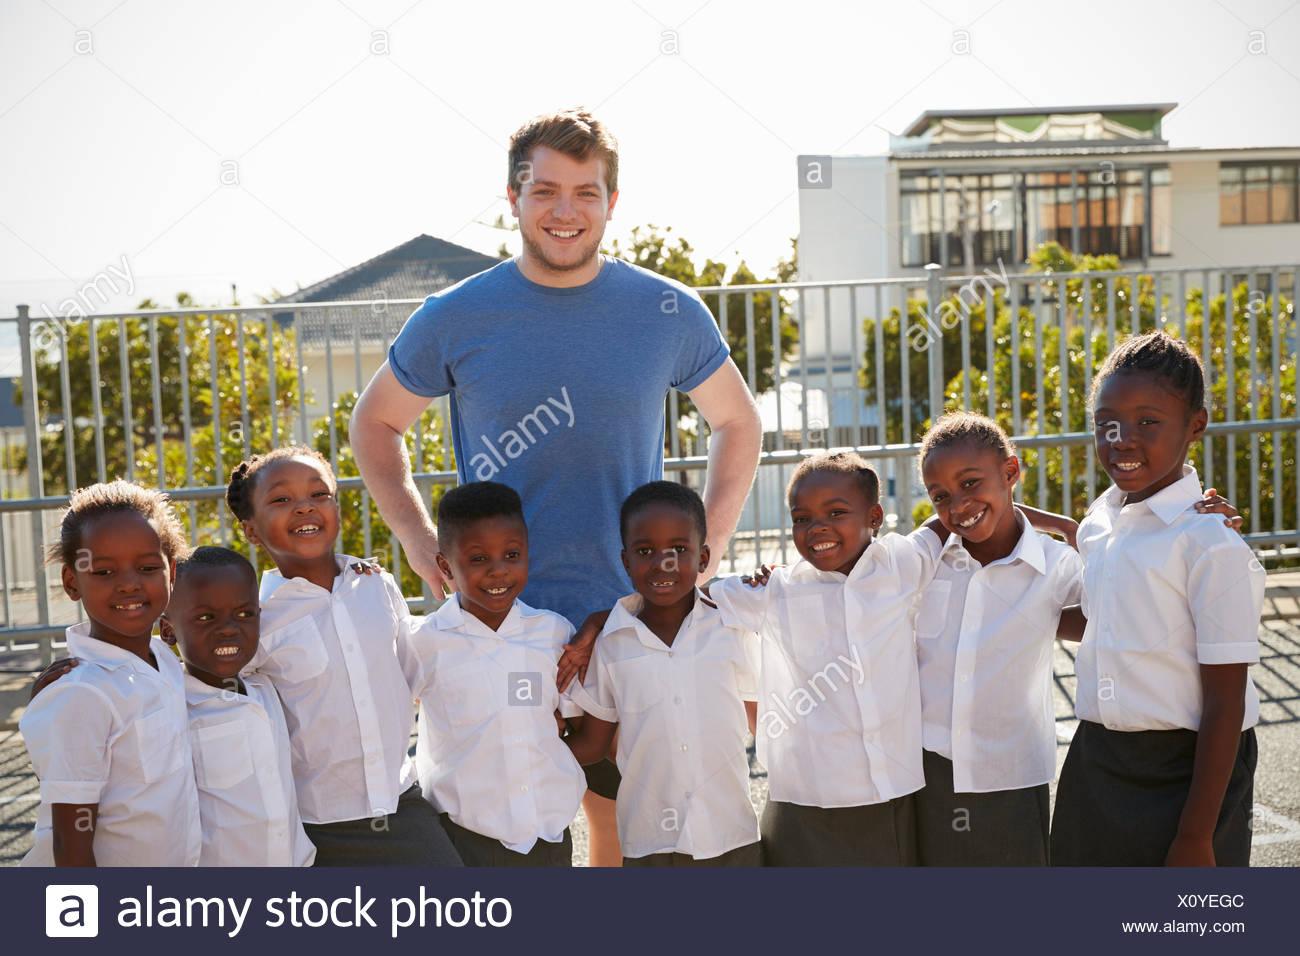 Volunteer and elementary school kids in playground, portrait - Stock Image